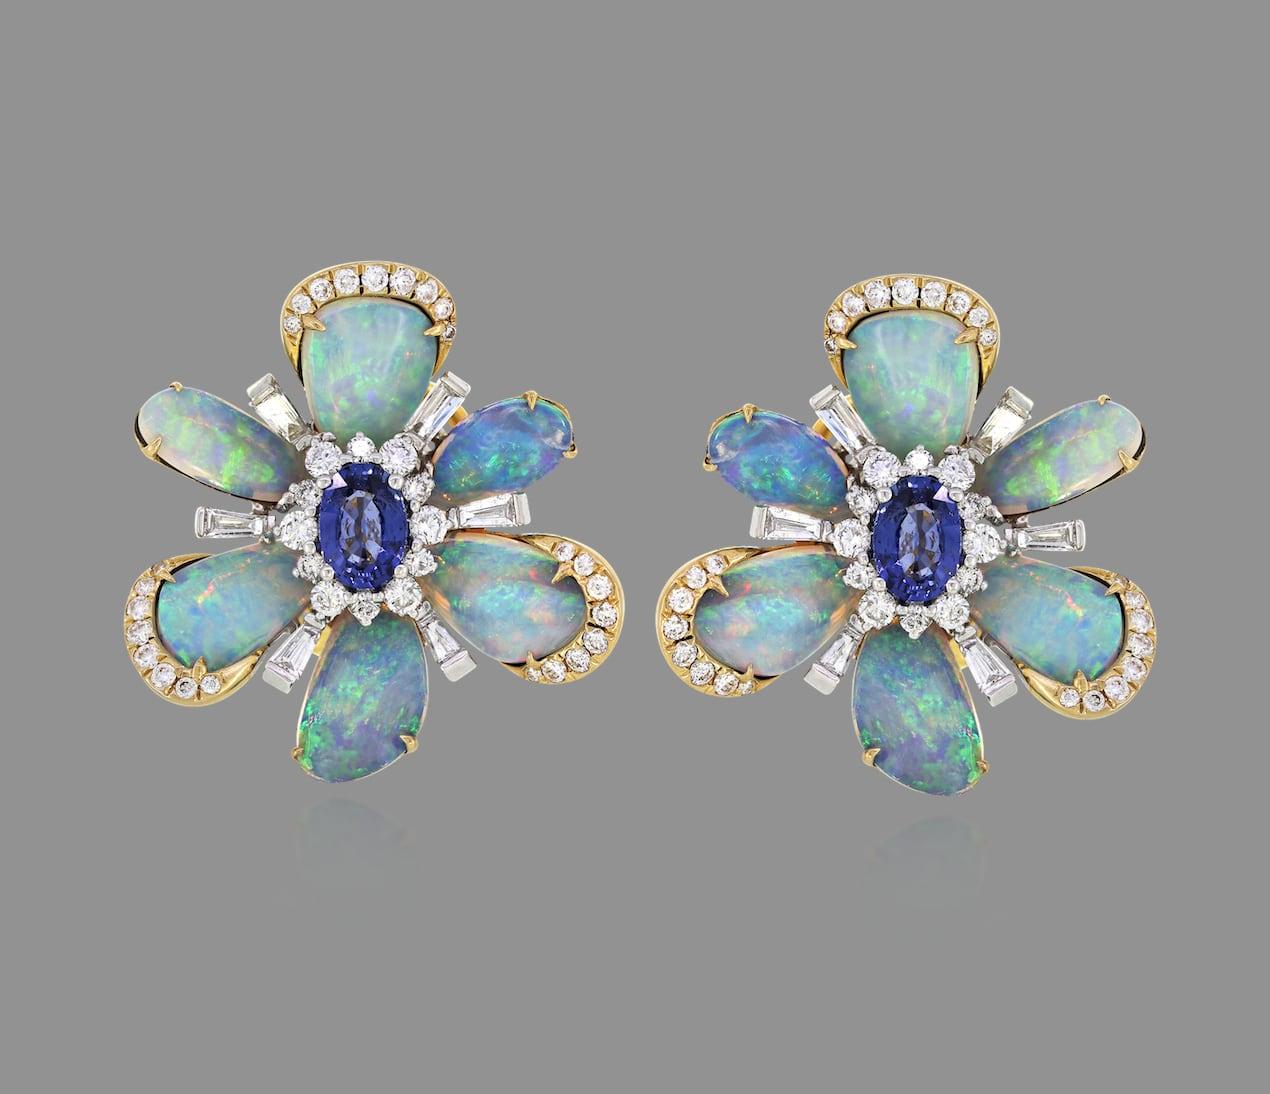 Flower-Jaipore-Jewels-ER3721-NJ12260